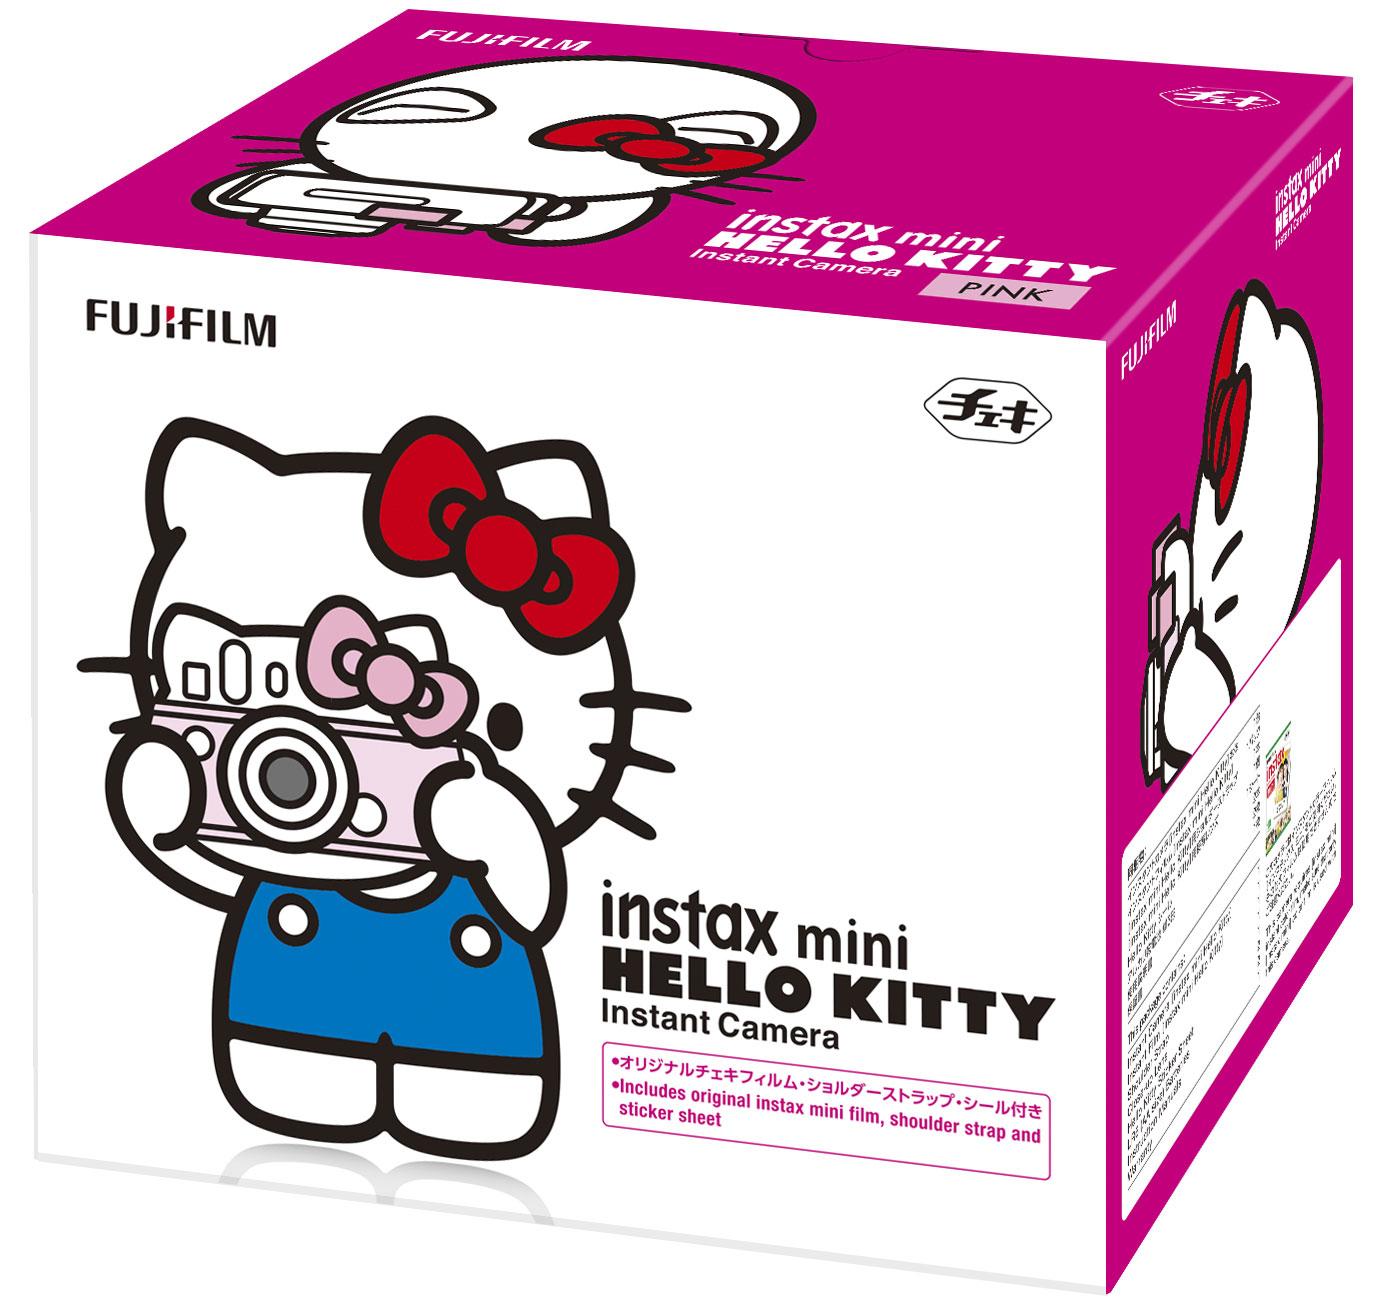 Fujifilm Instax Mini Hello Kitty, Pinkфотоаппарат моментальной печати Fujifilm